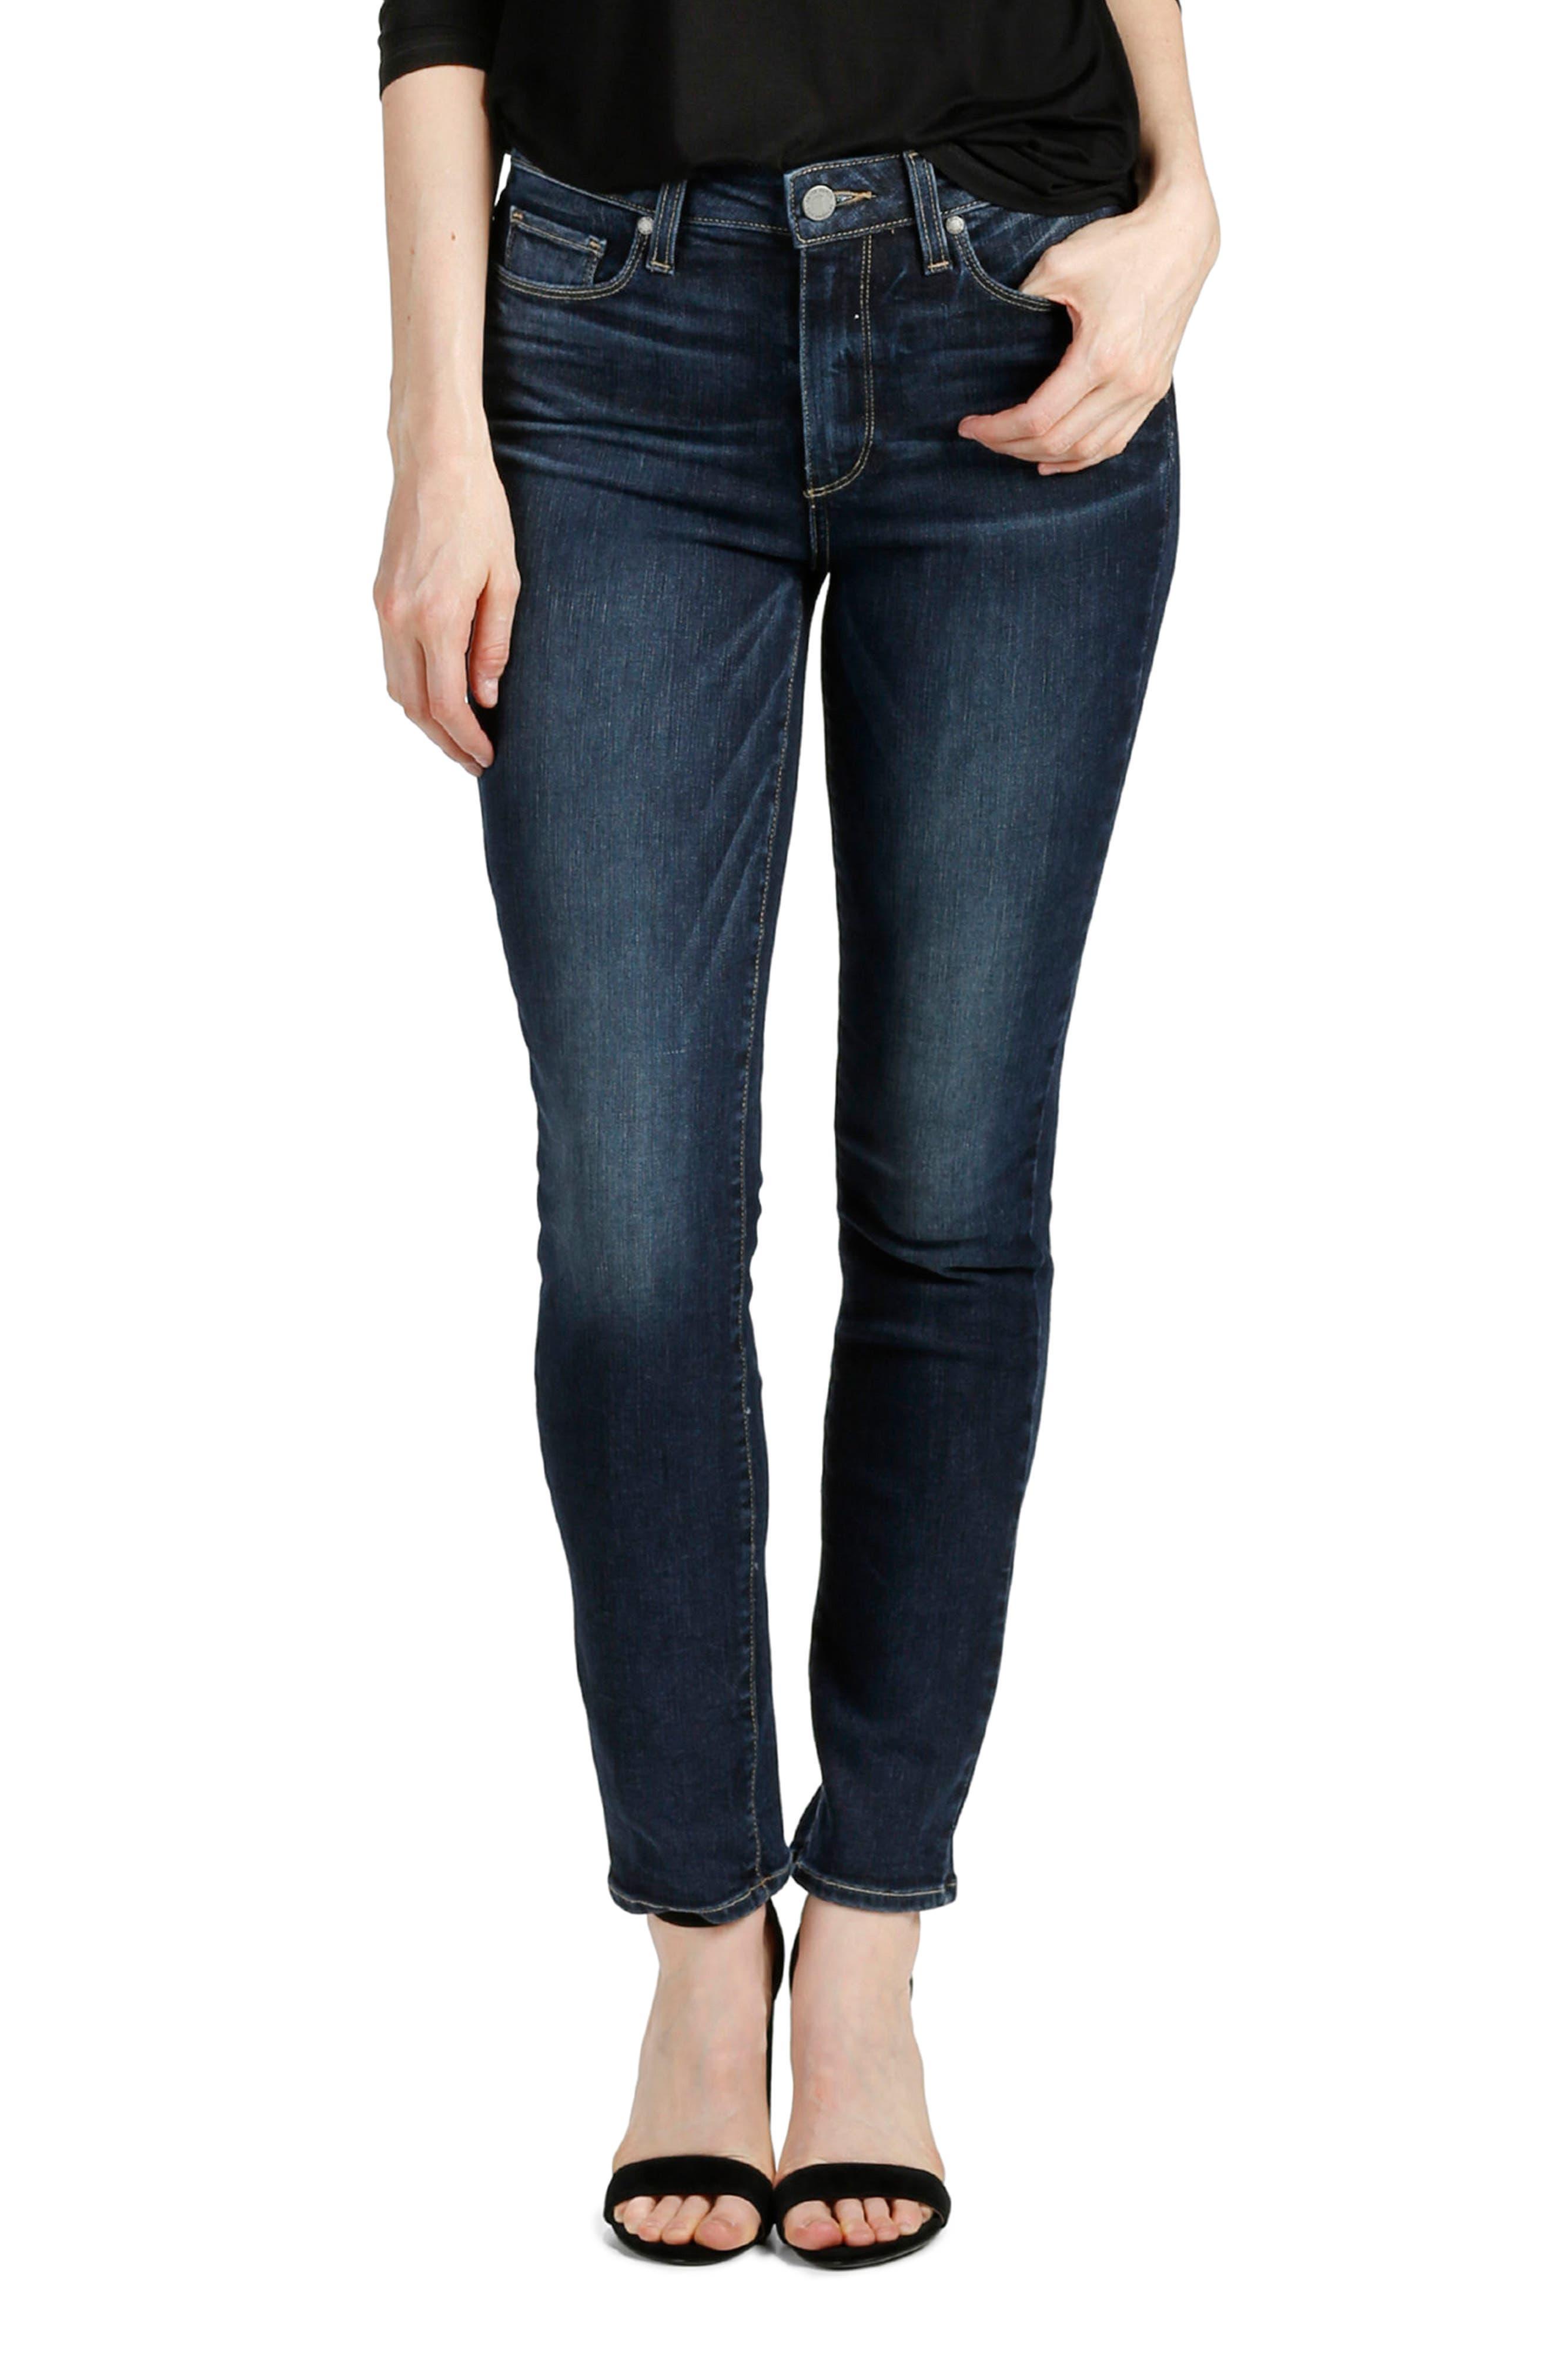 Transcend Vintage - Hoxton Ankle Peg Skinny Jeans,                         Main,                         color, 400